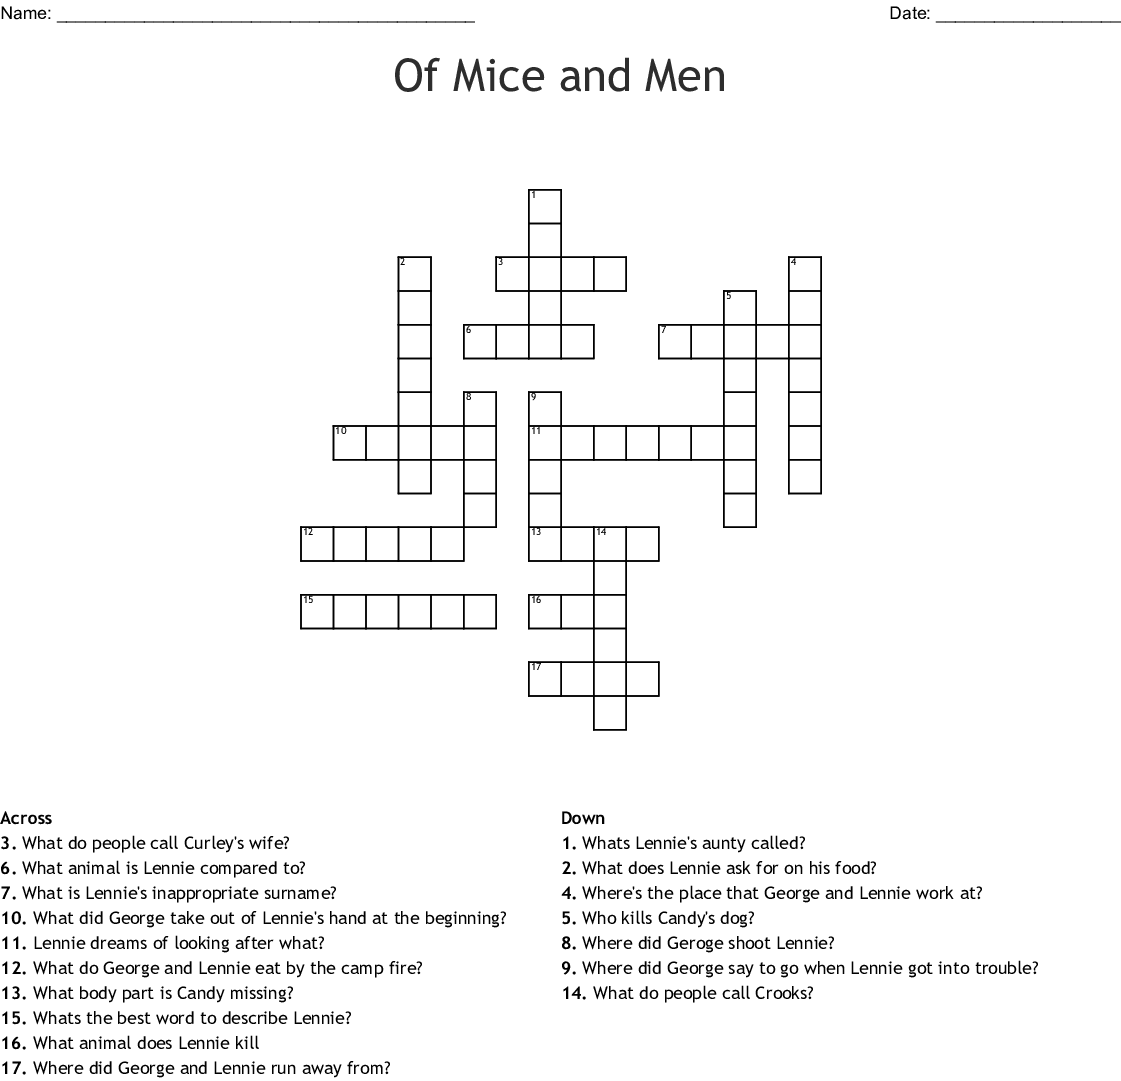 Of Mice And Men Crossword